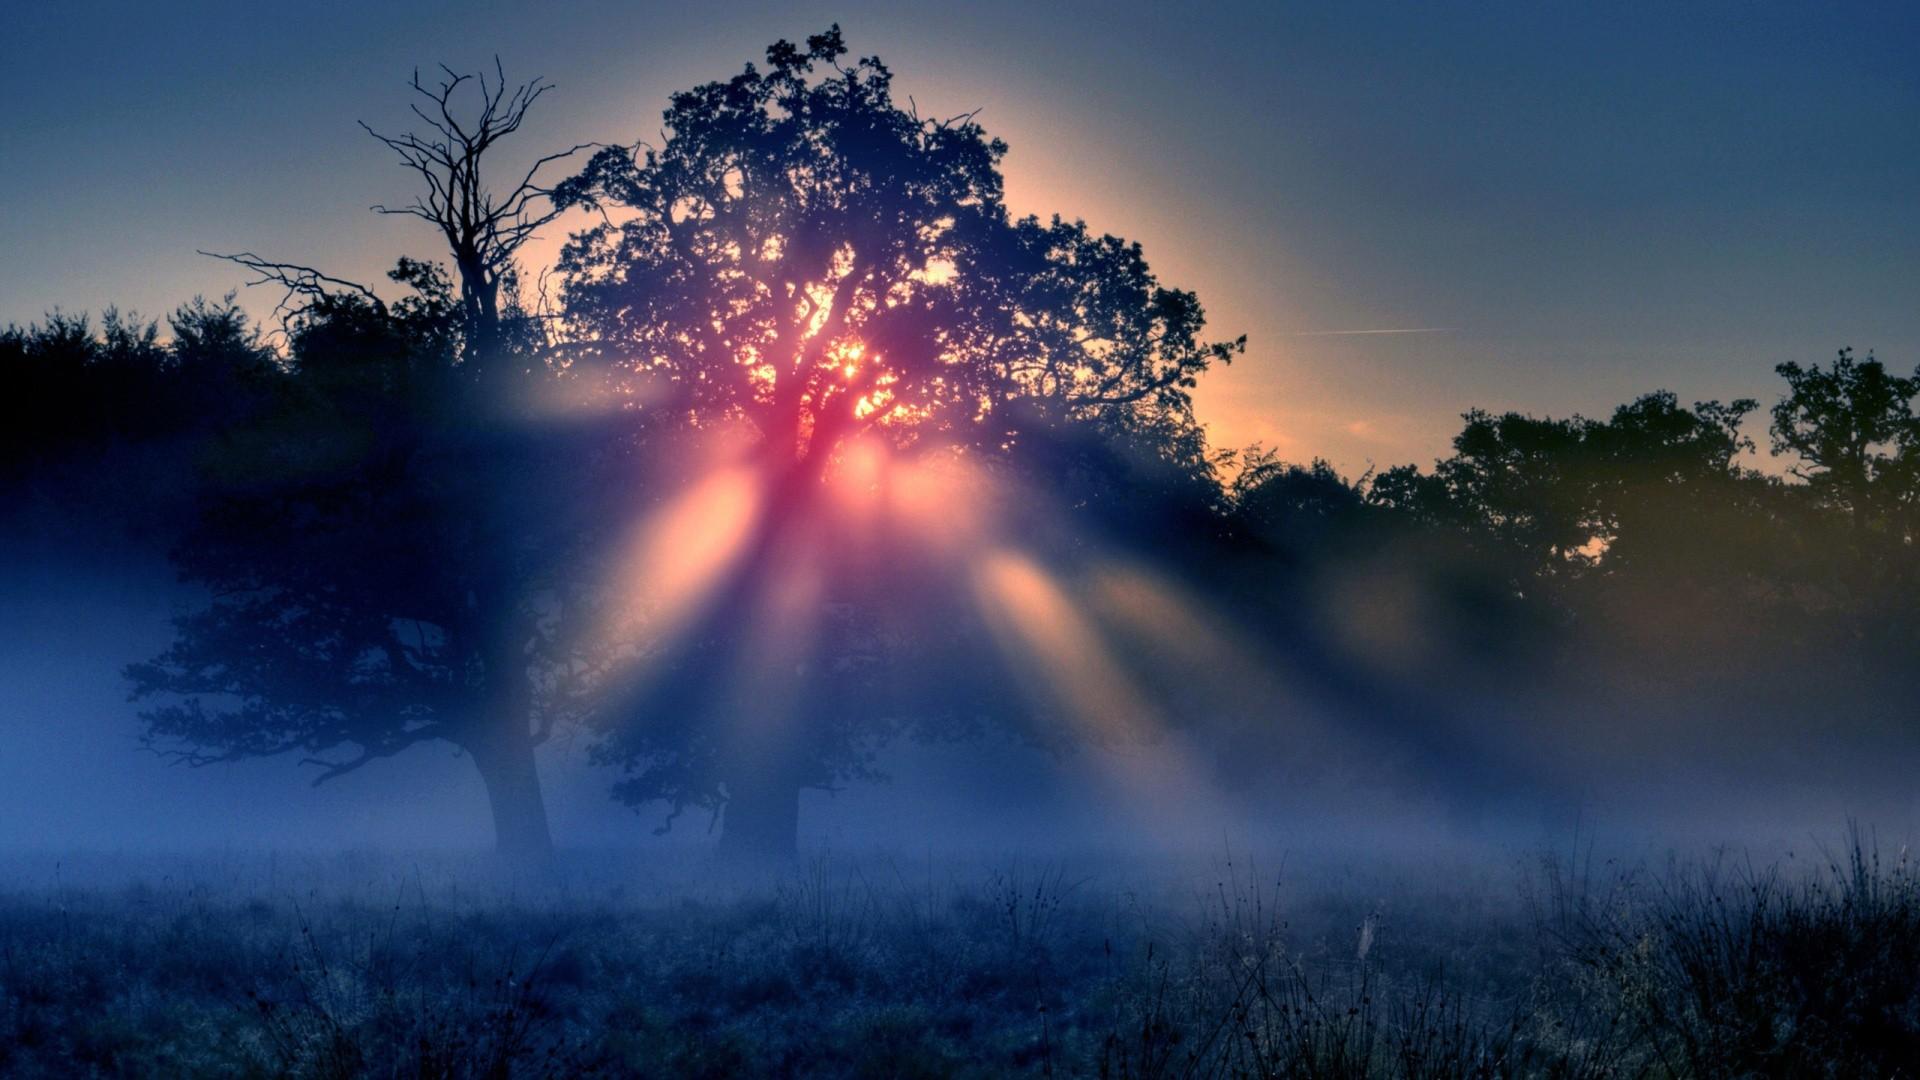 Солнечные лучи. Rays of the Sun in the fog